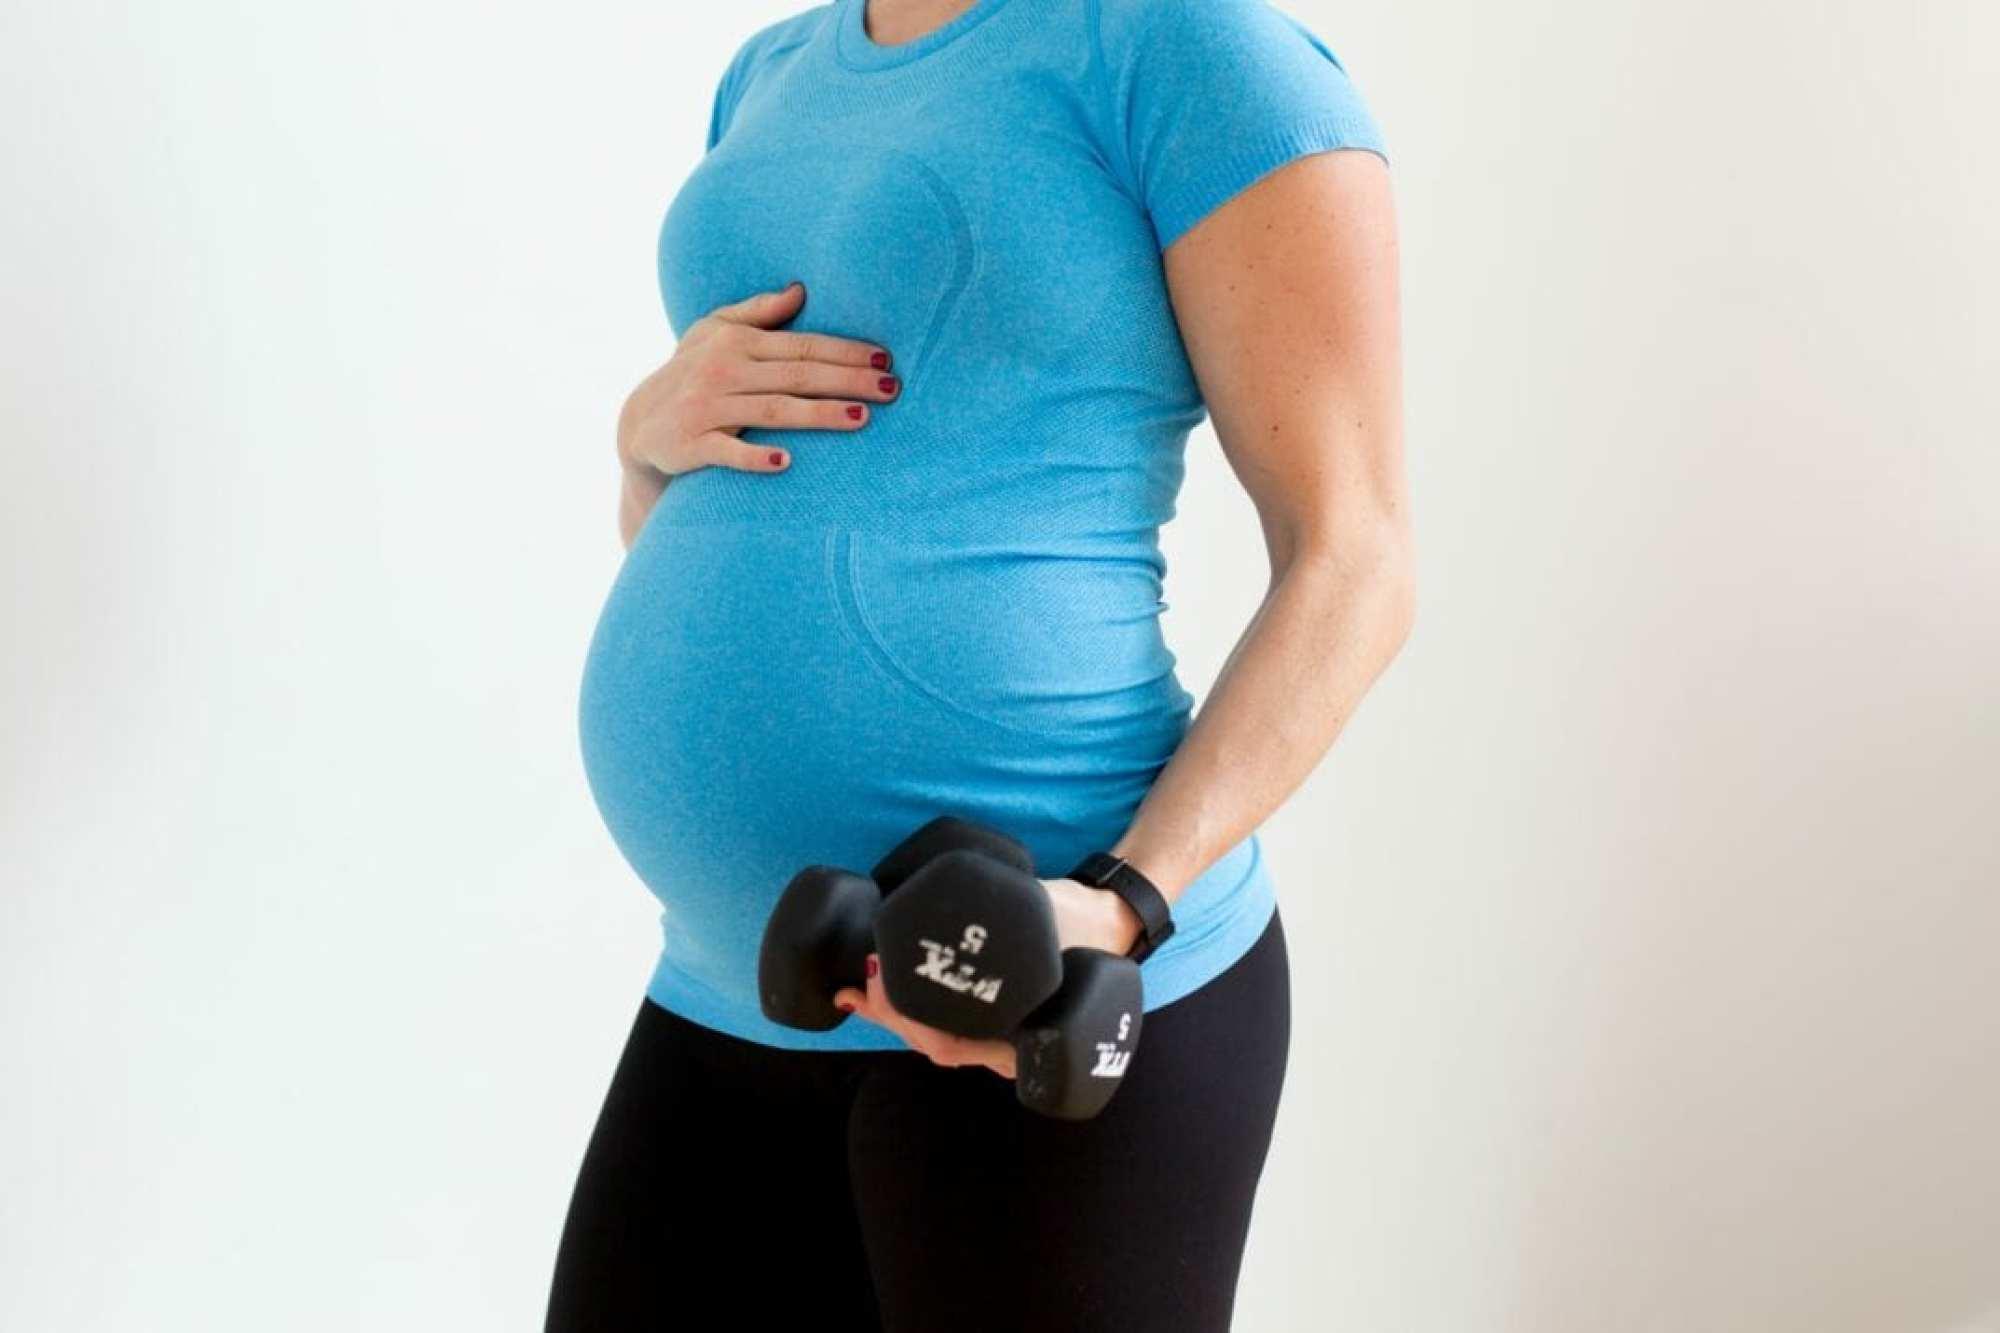 Fit Pregnancy Fitness Essentials